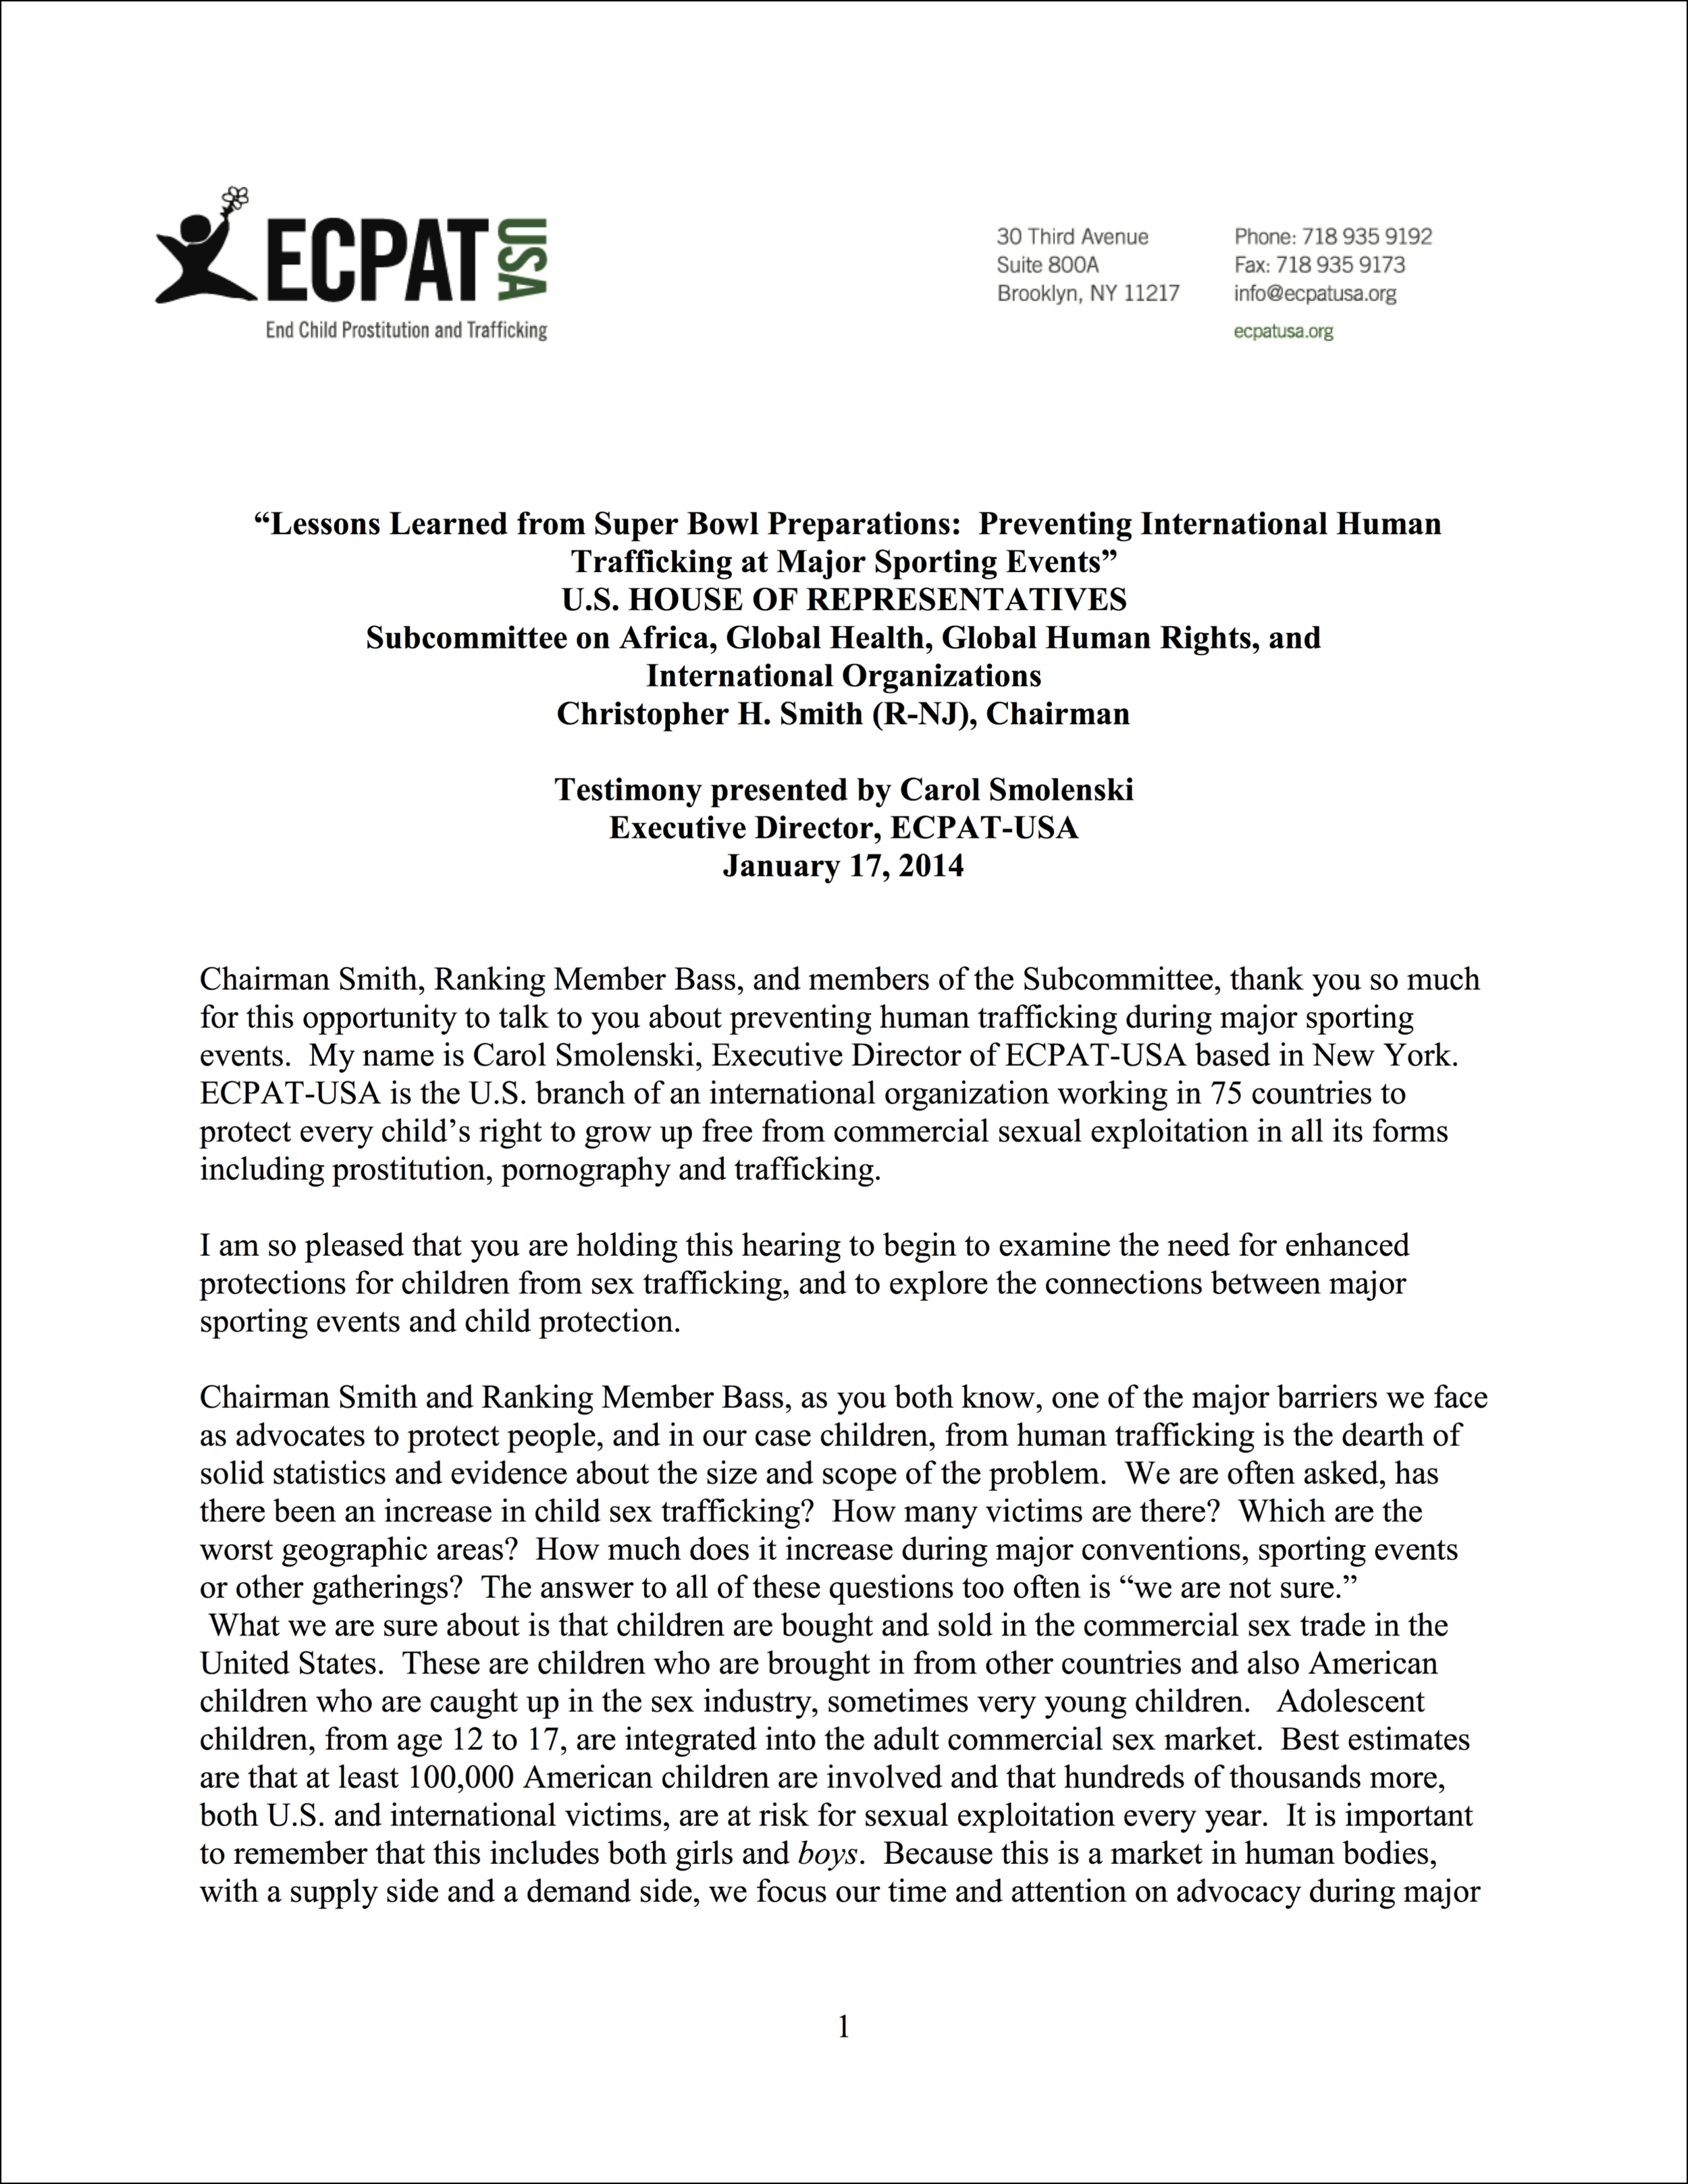 ECPAT-USA_SuperBowl.png